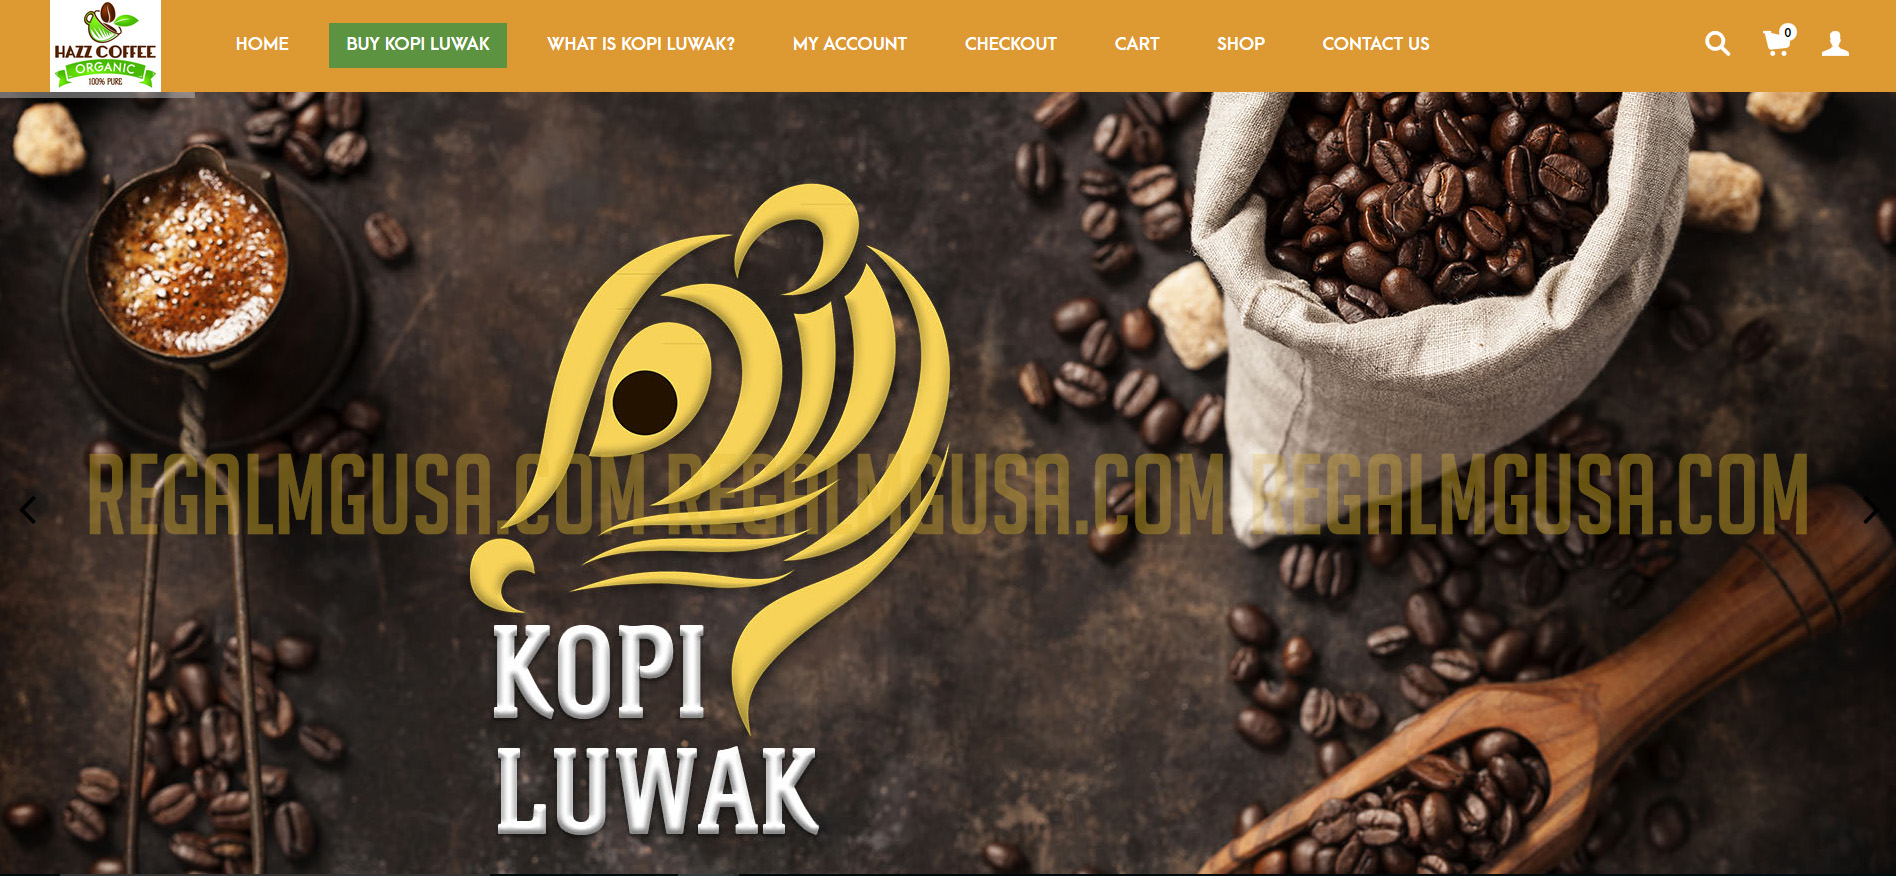 Hazz Coffee Regal MG Ecommerce Website Screenshot